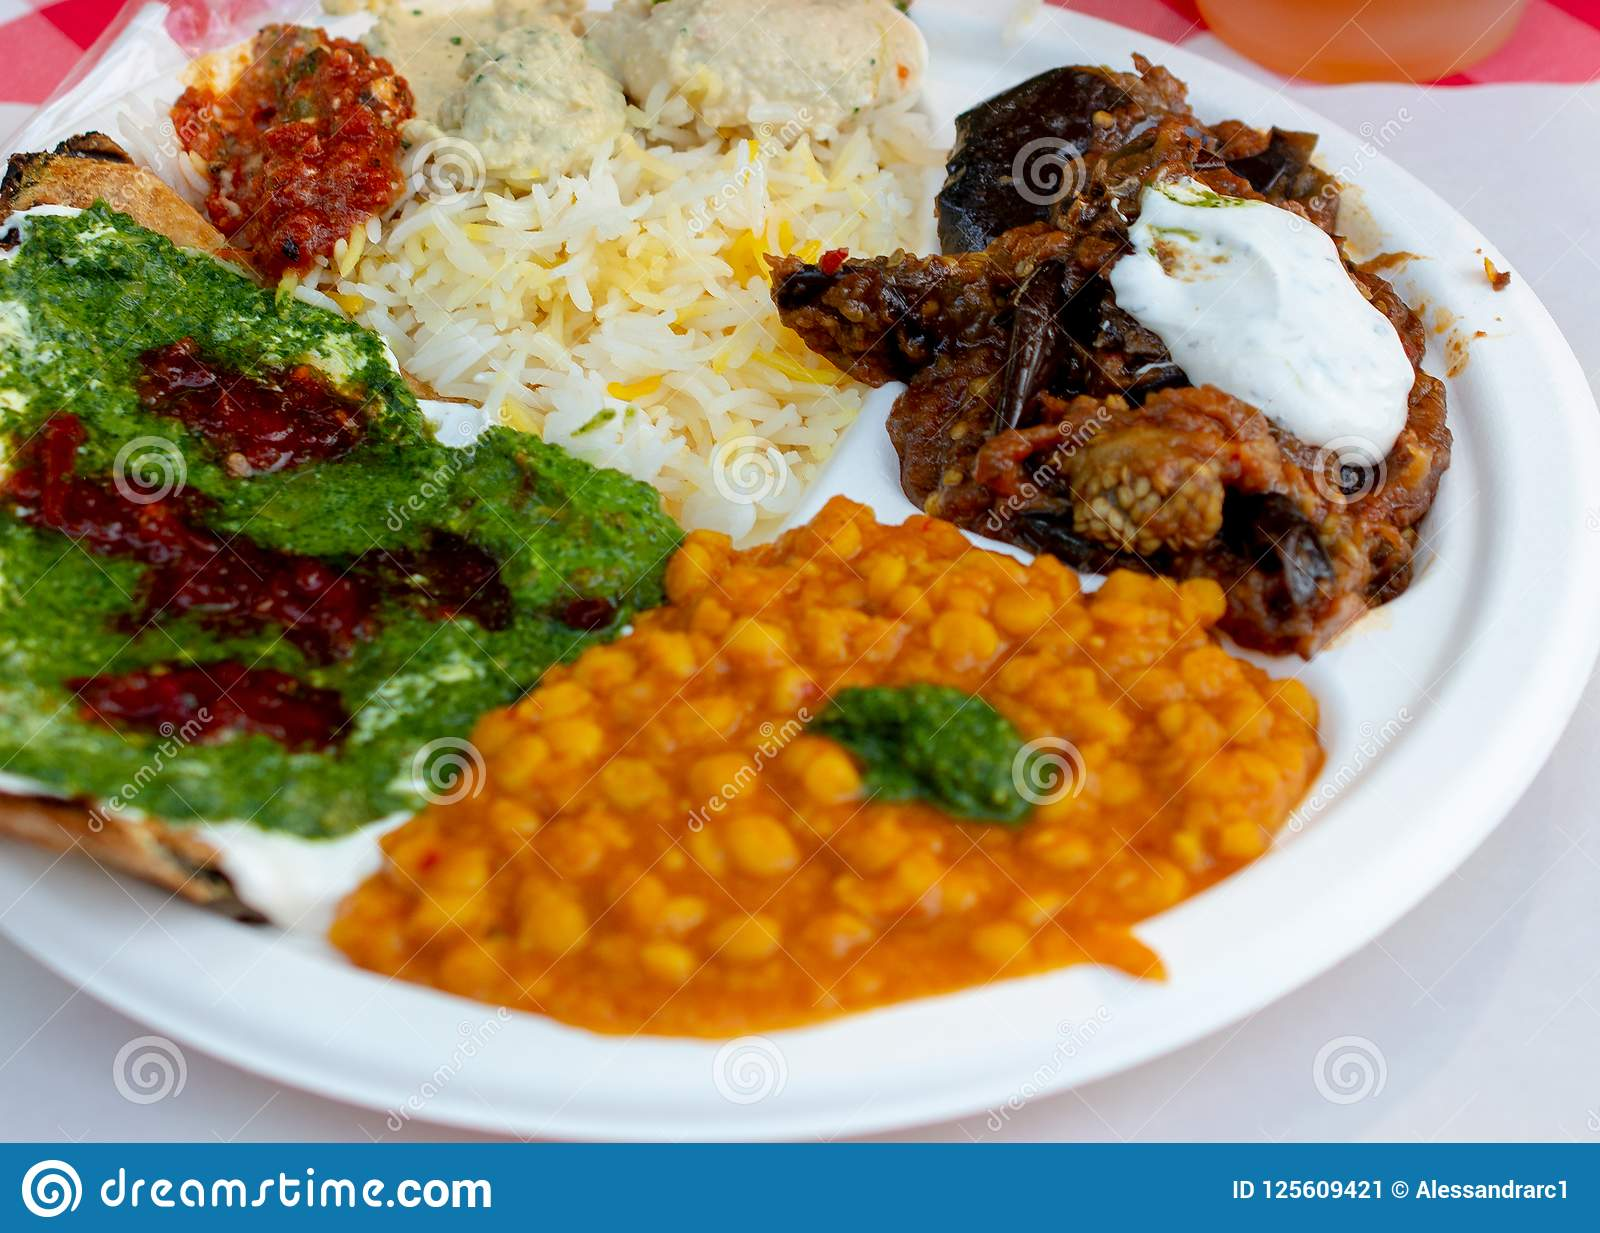 Vegetarian Mediterranean Dish On White Dish Stock Image Image Of Angle Ready 125609421